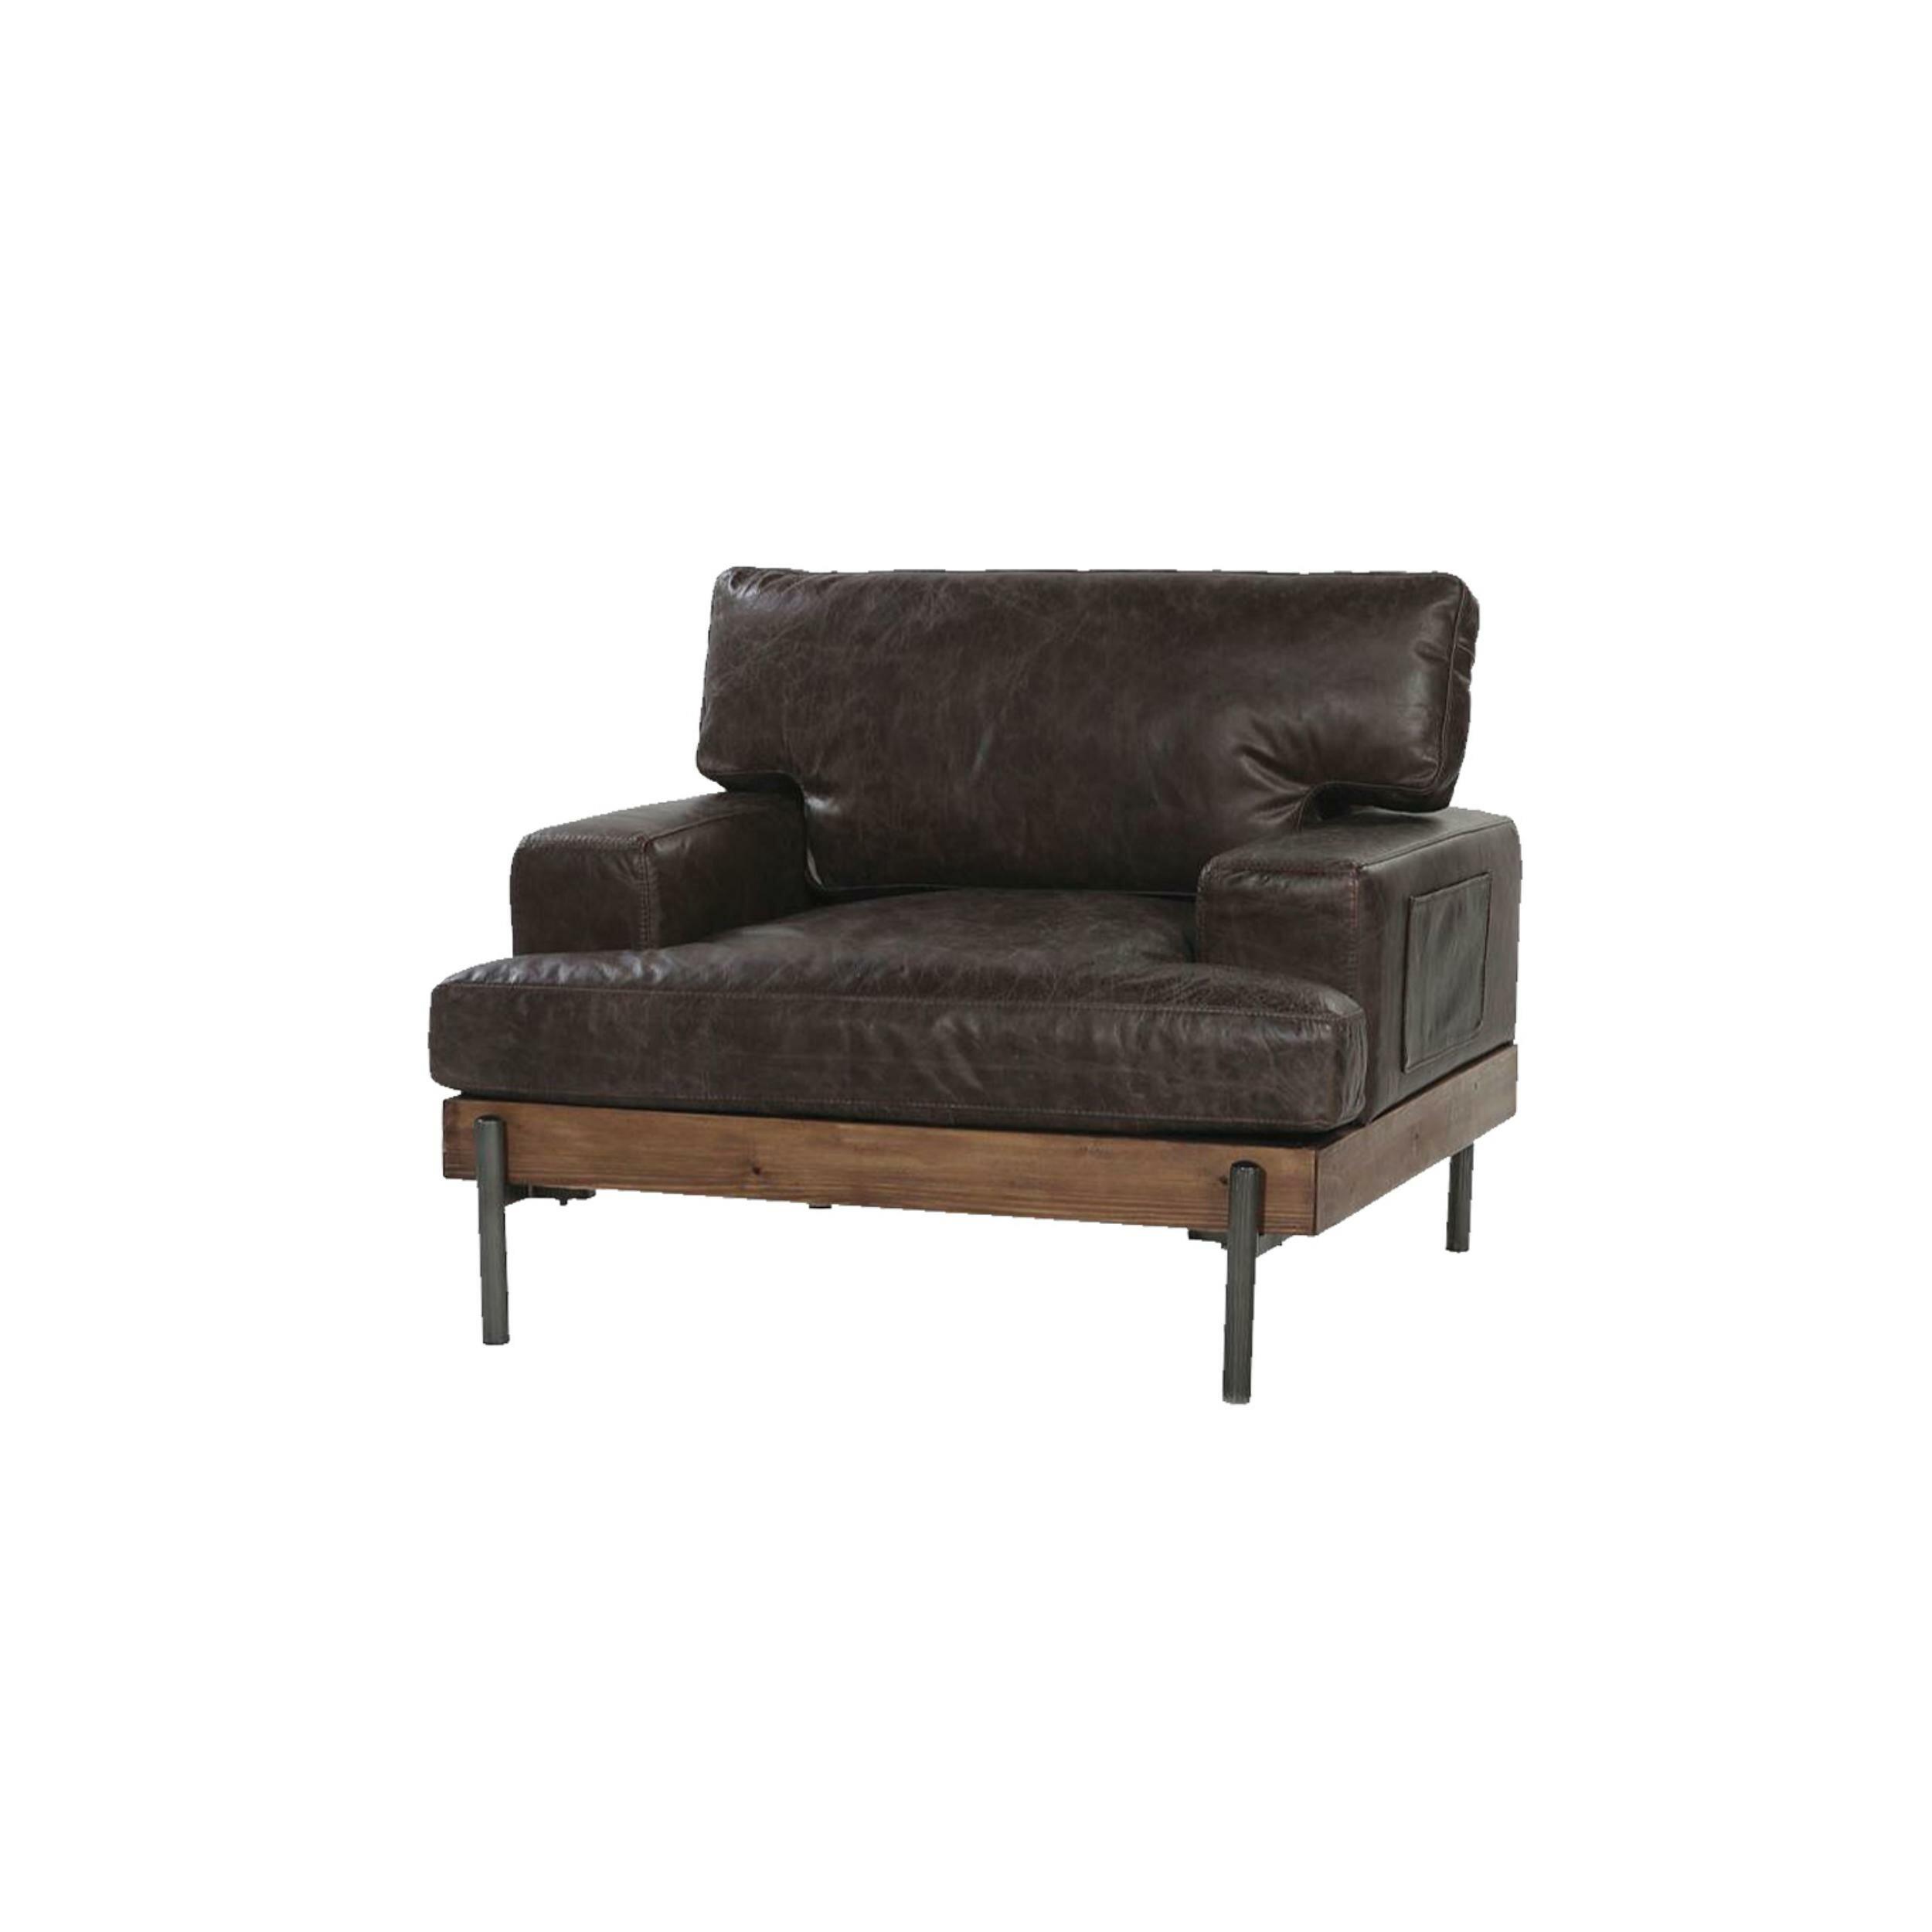 Sensational Toulouse Vintage Leather And Wood Armchair Creativecarmelina Interior Chair Design Creativecarmelinacom